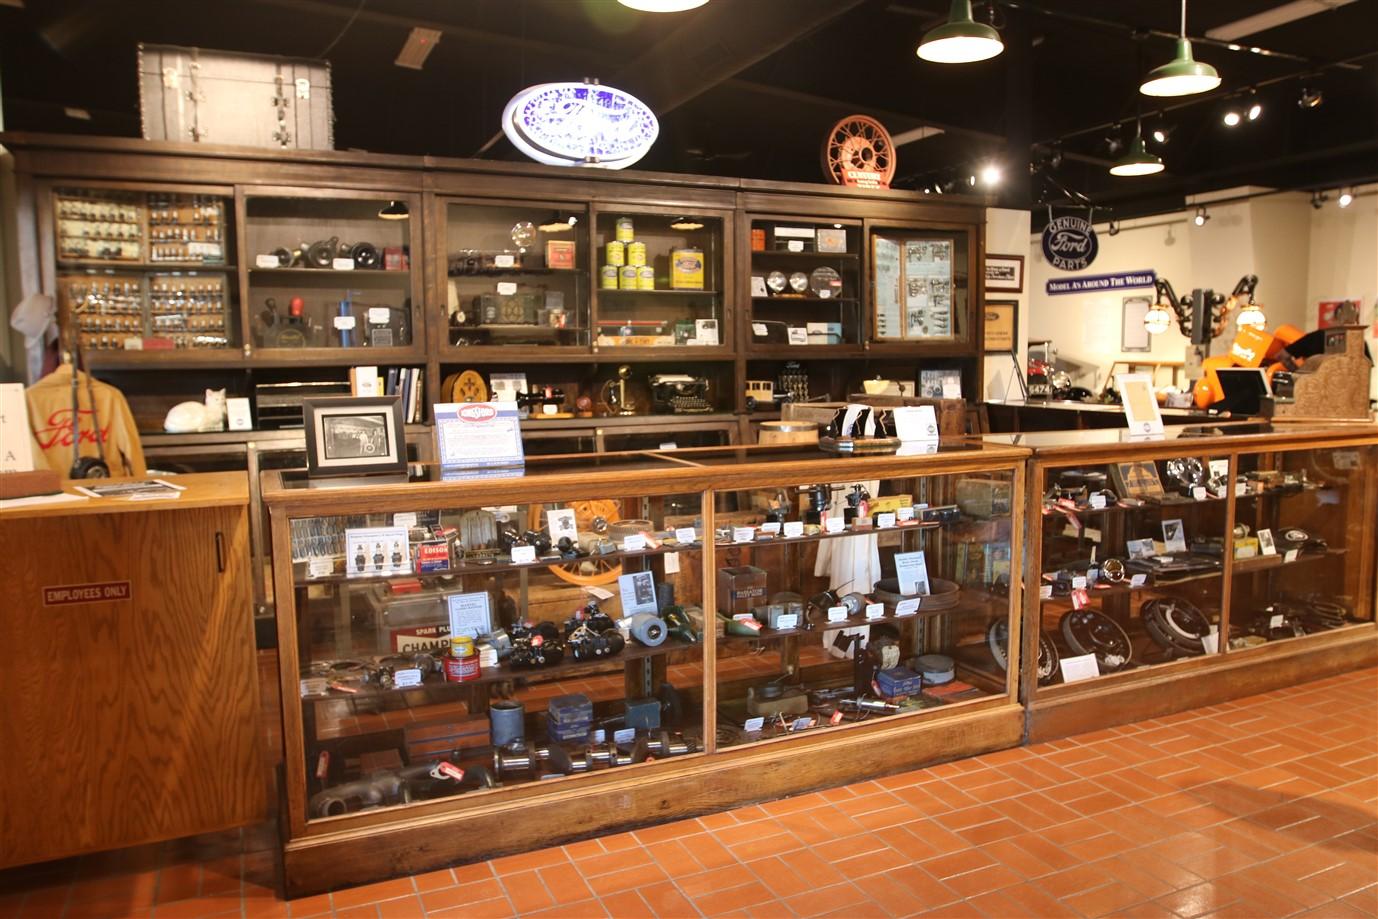 2018 09 03 361 Hickory Corners MI Gilmore Car Museum.jpg